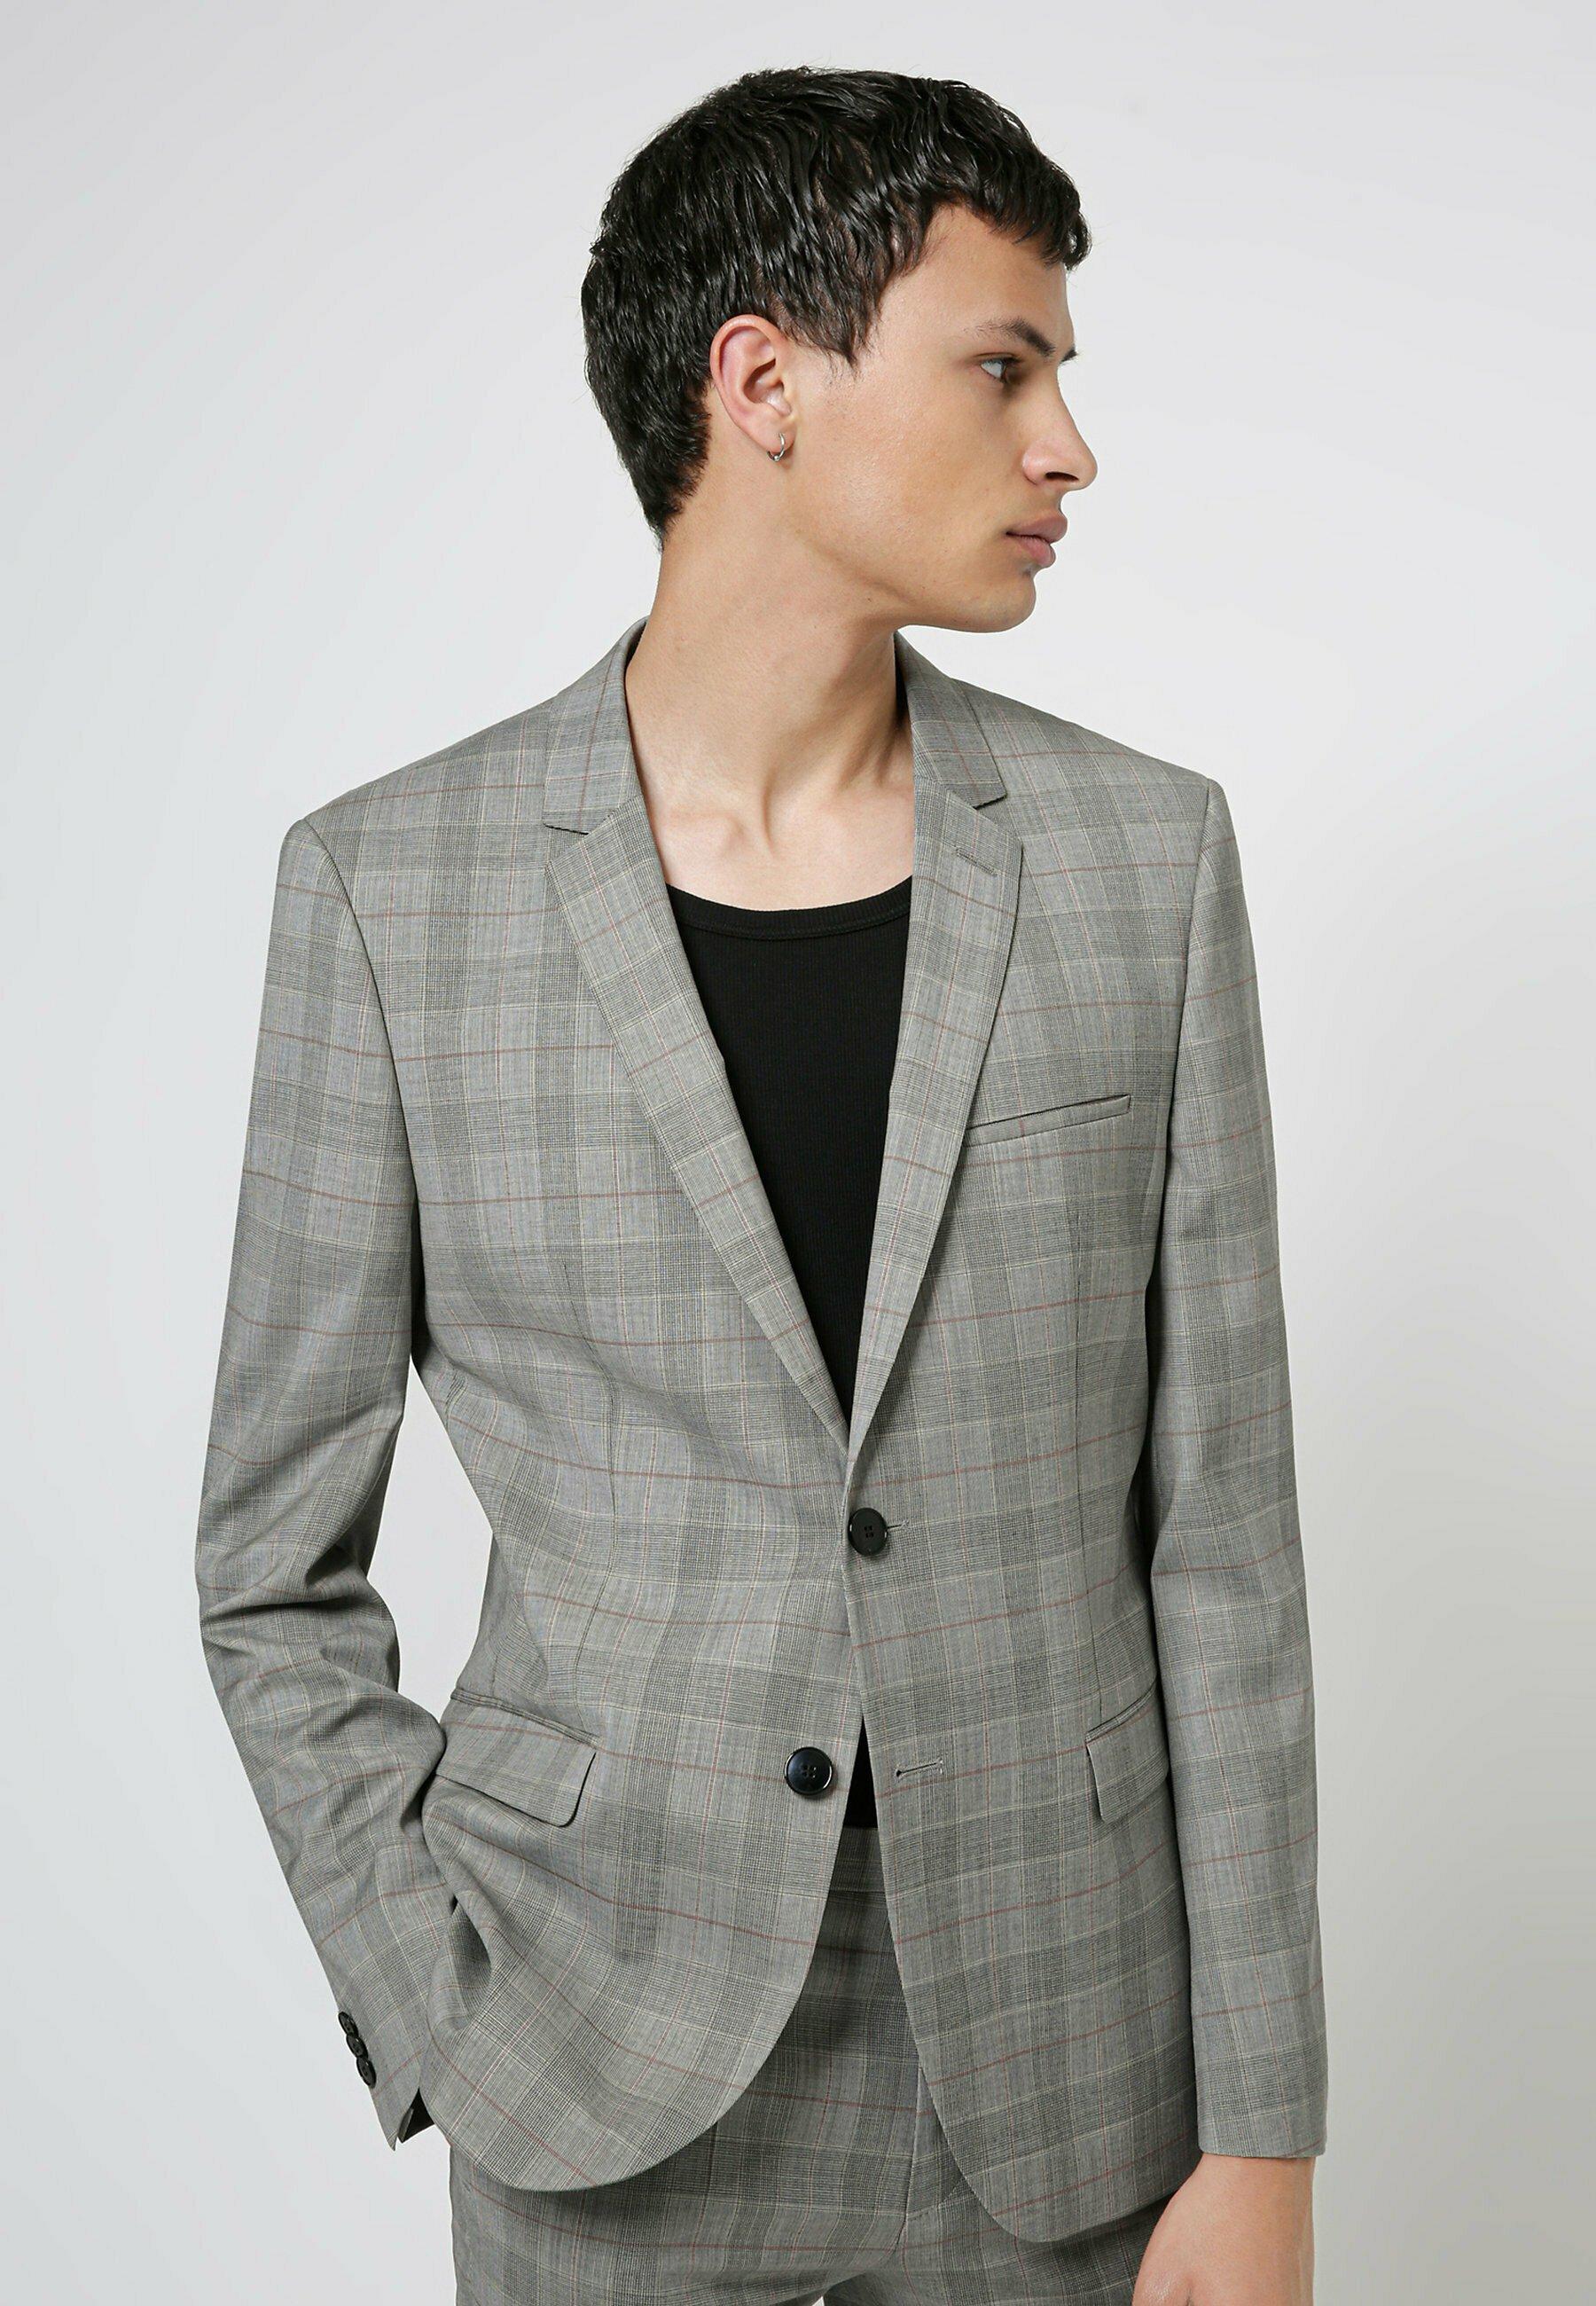 Homme ARTI/HESTEN - Costume